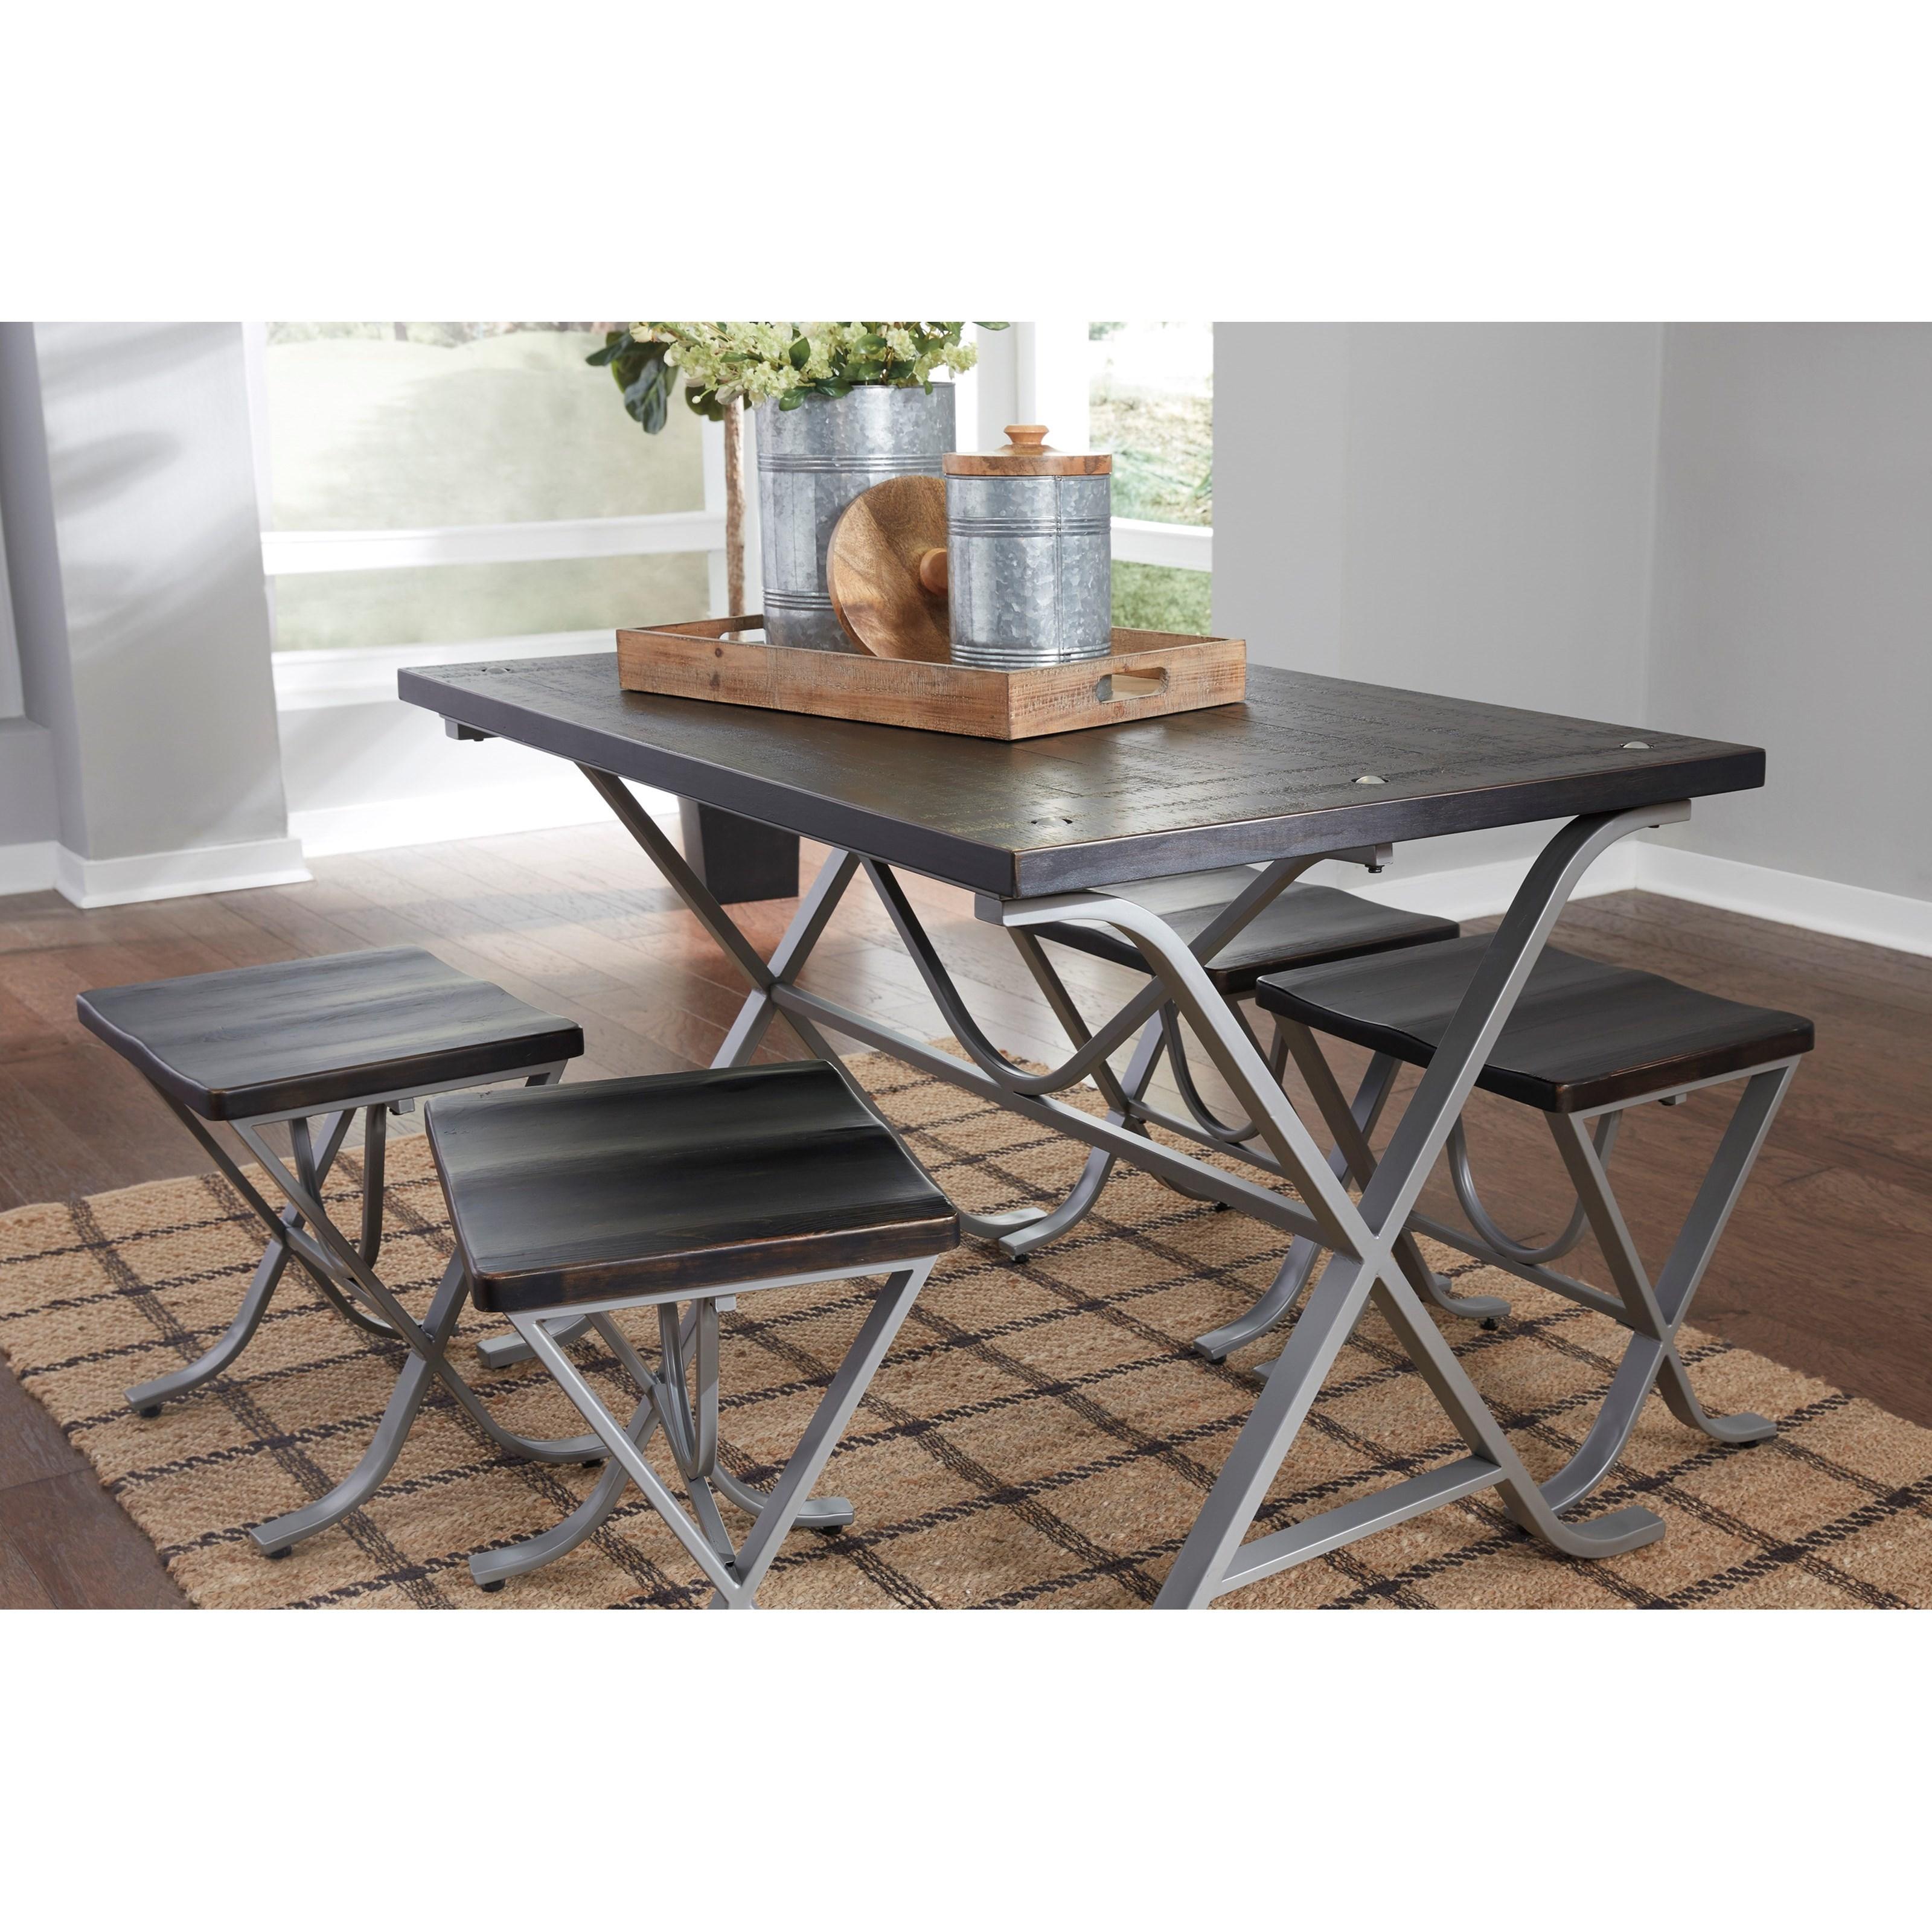 signature design by ashley elistree wood and metal 5 piece rectangular dining room table set. Black Bedroom Furniture Sets. Home Design Ideas